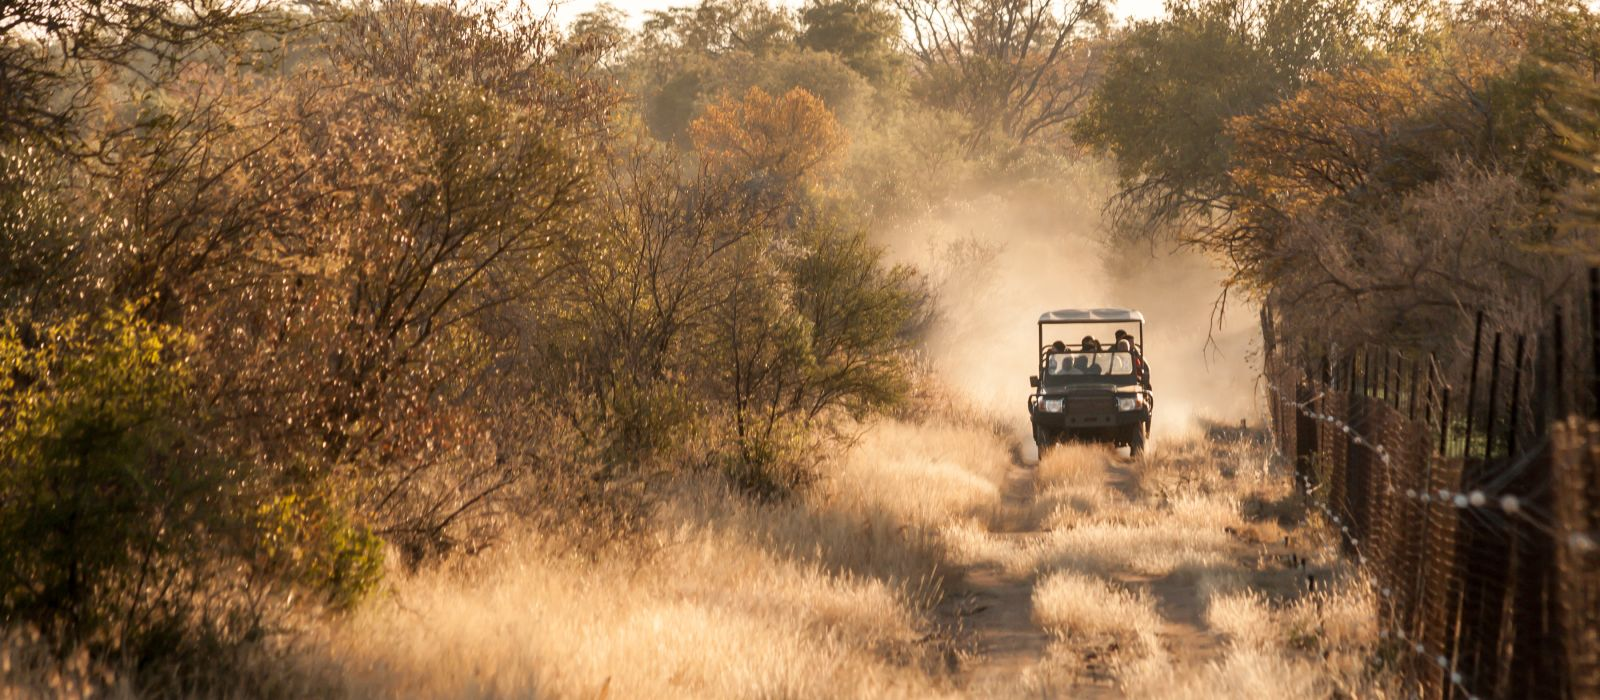 Selbstfahrer-Reise nach Südafrika, Namibia & Simbabwe: Nord Kap via Caprivi und Viktoriafälle Urlaub 9